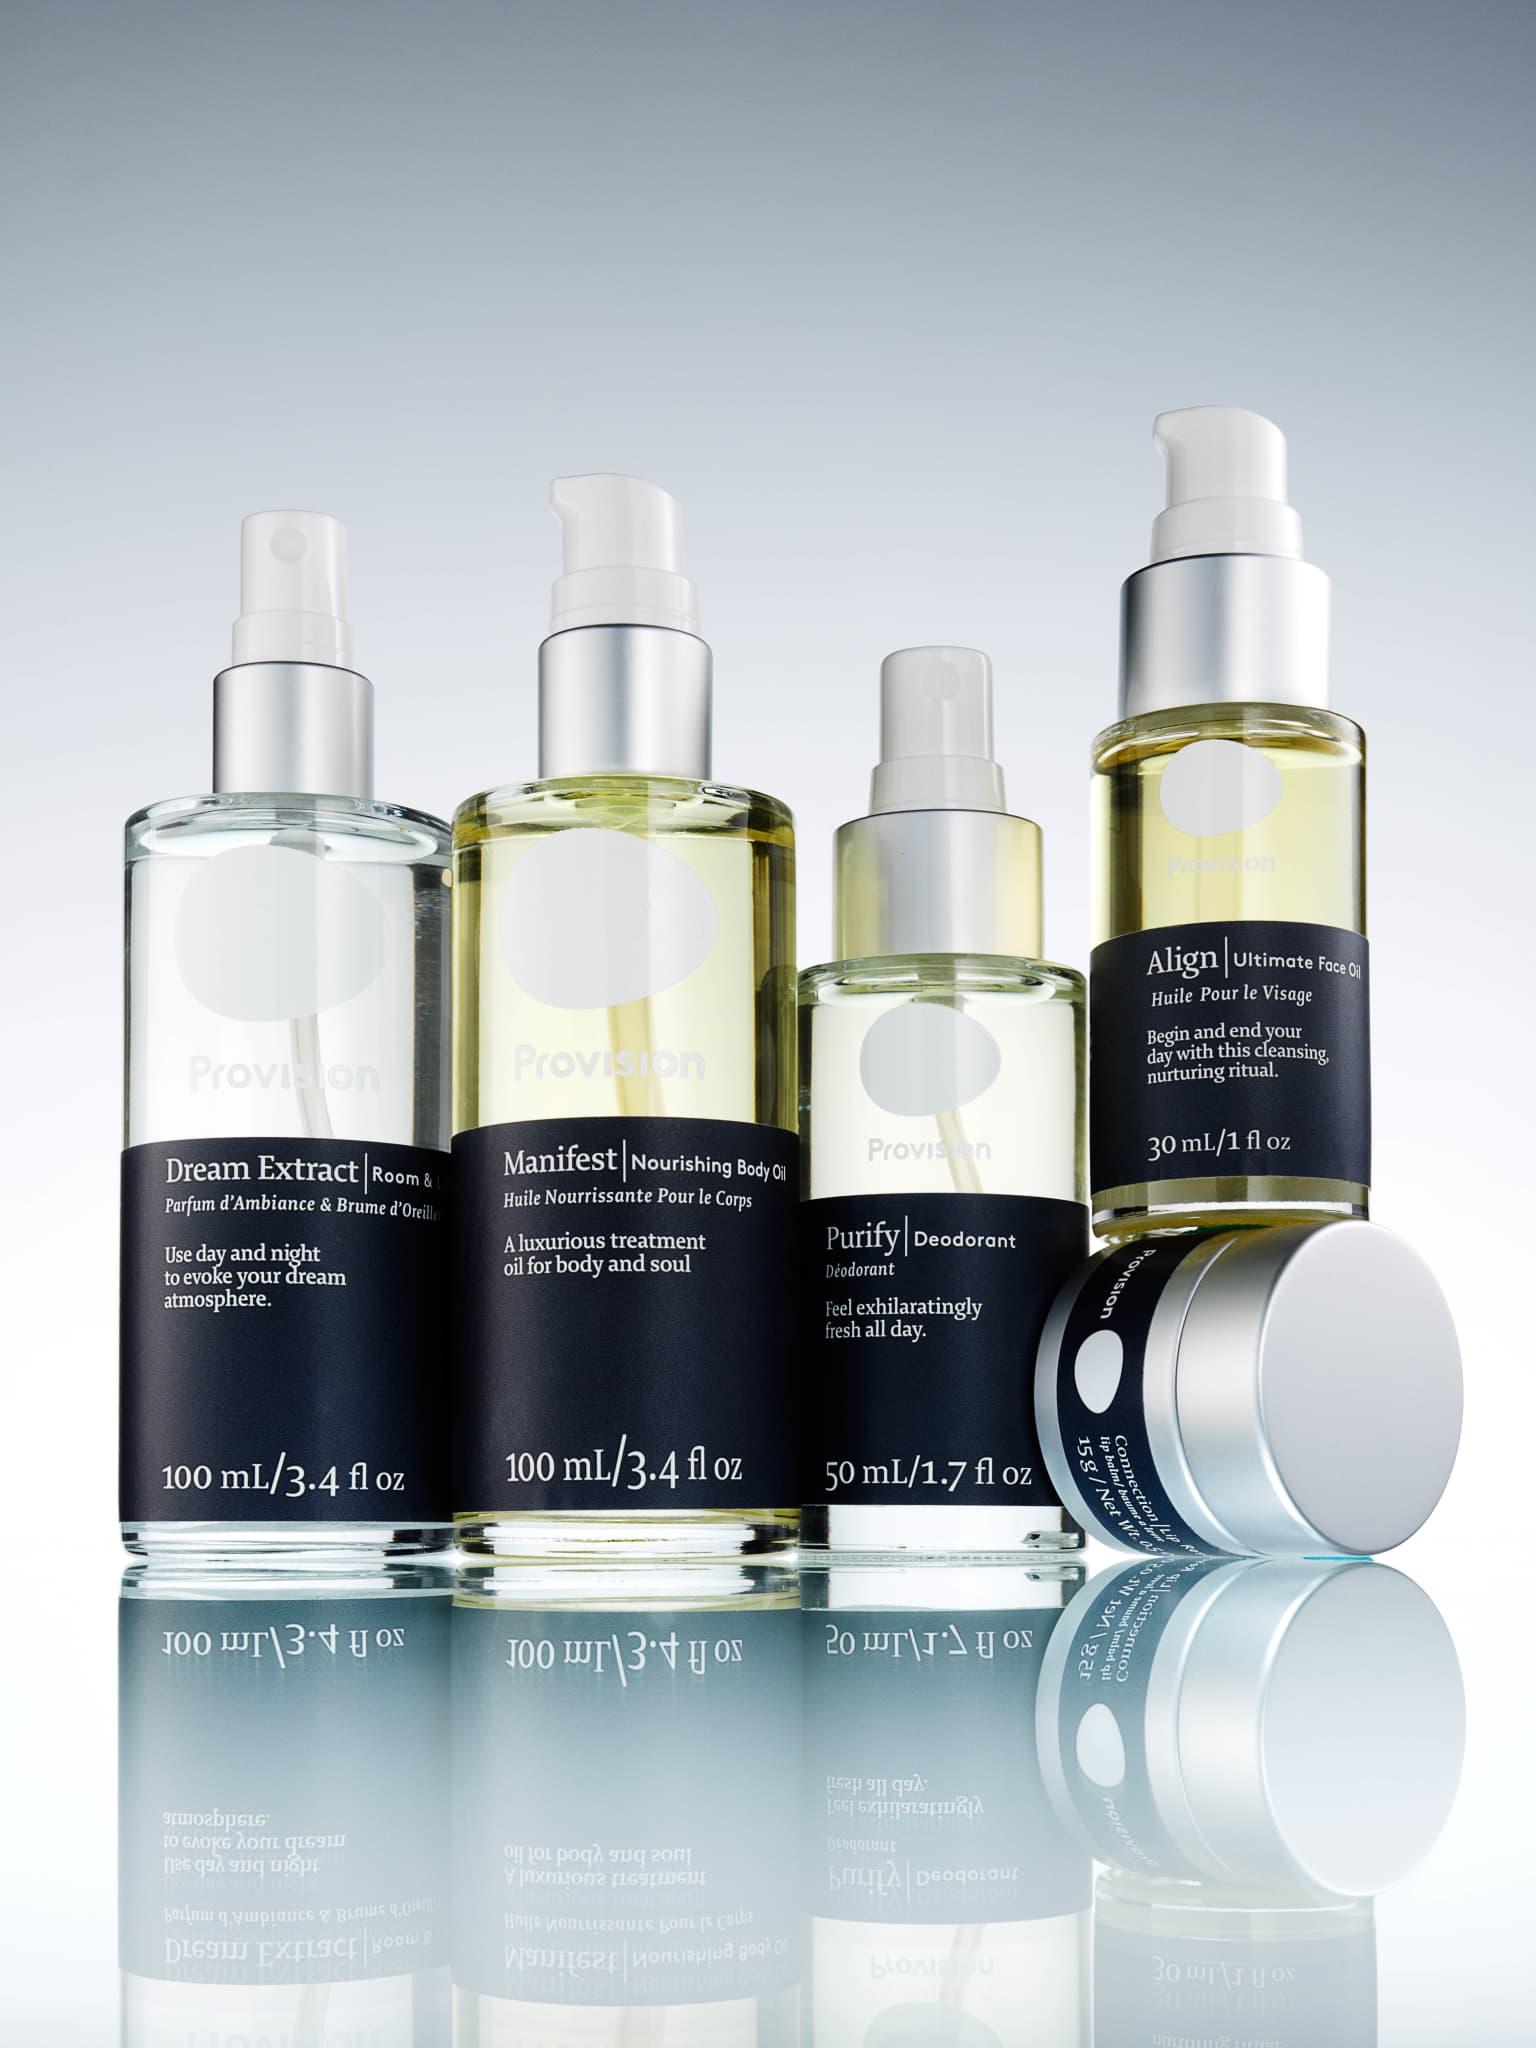 Provision Cosmetcs